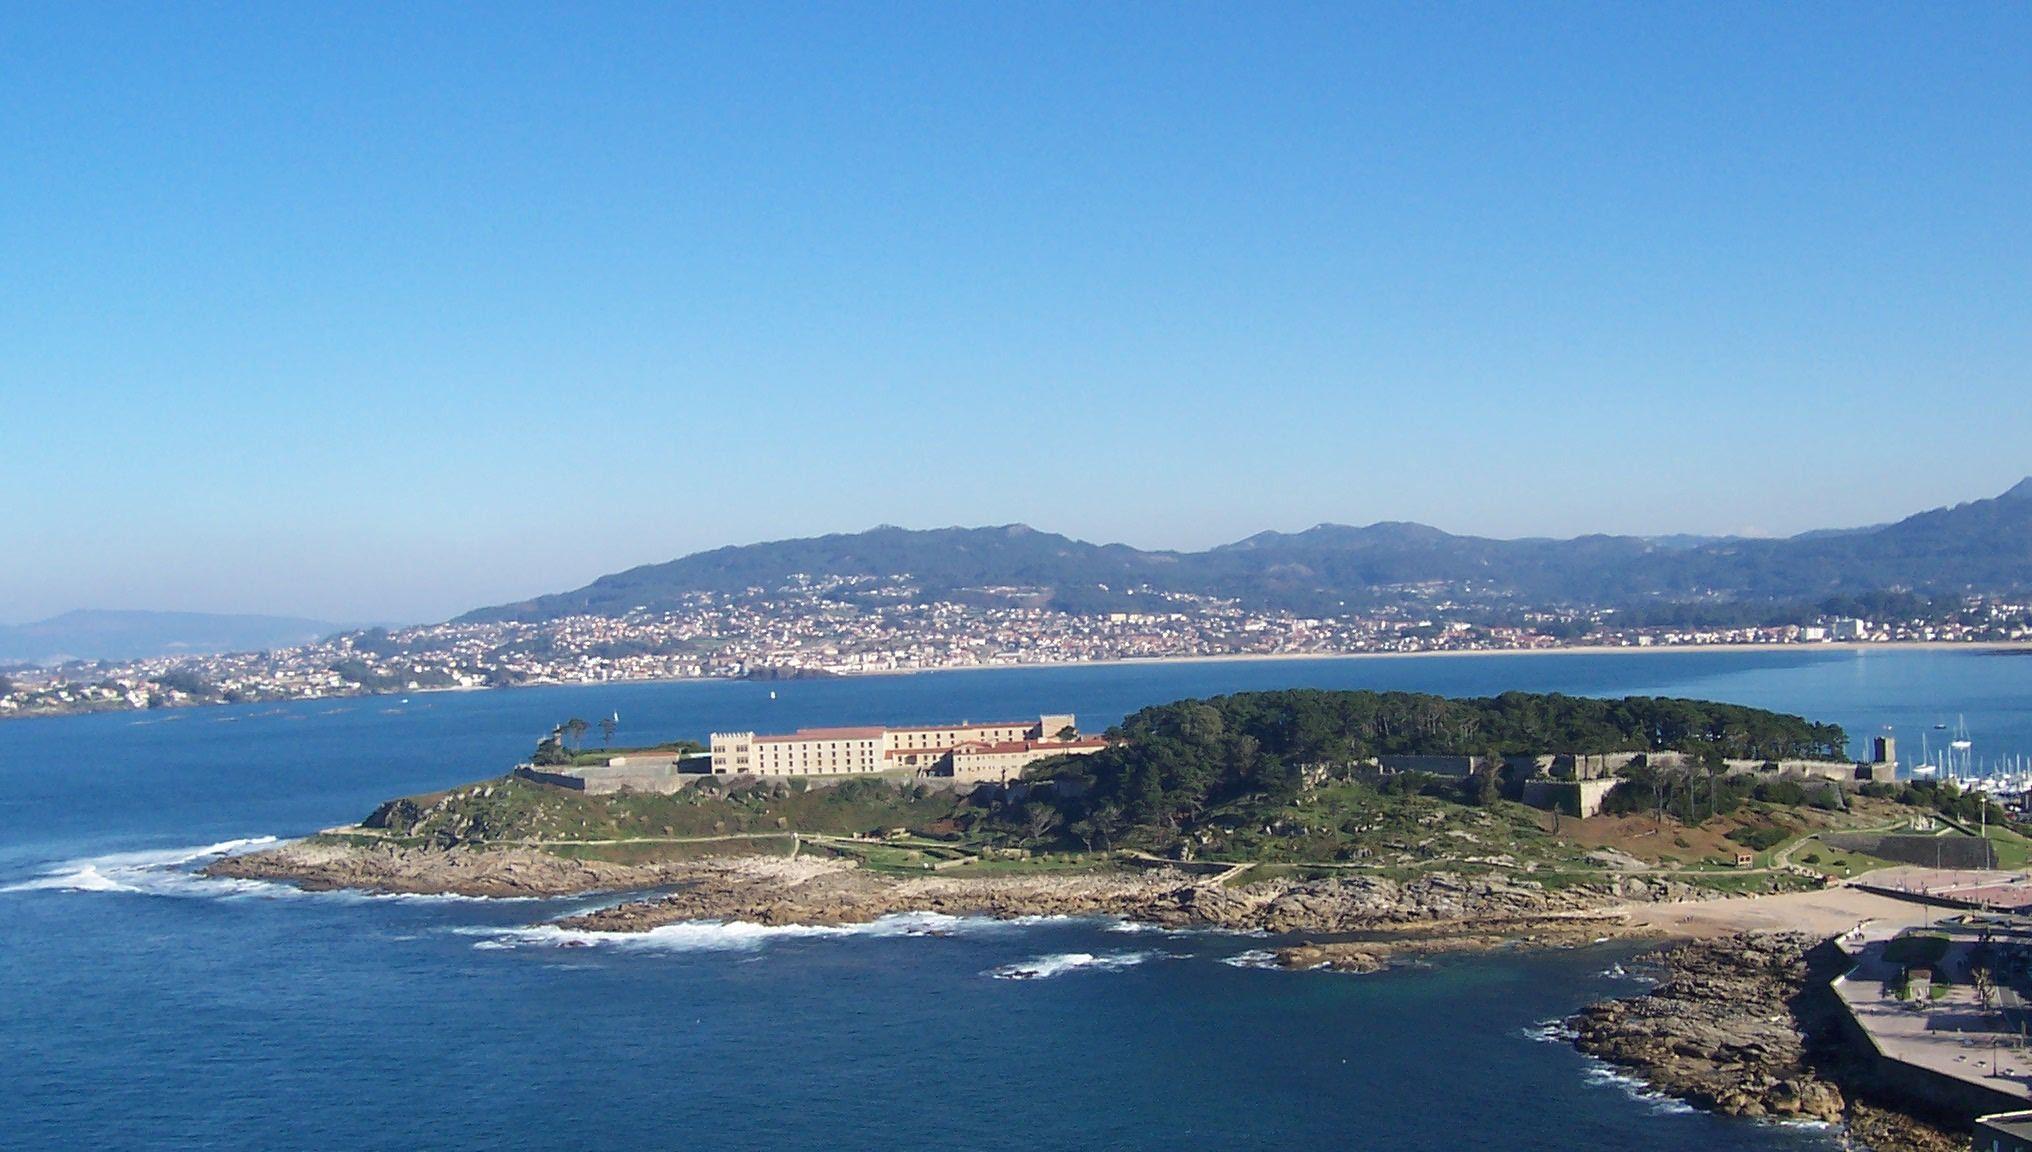 baiona galicia | File:Castelo de Monterreal, parador de Baiona, Galicia (Spain).jpg